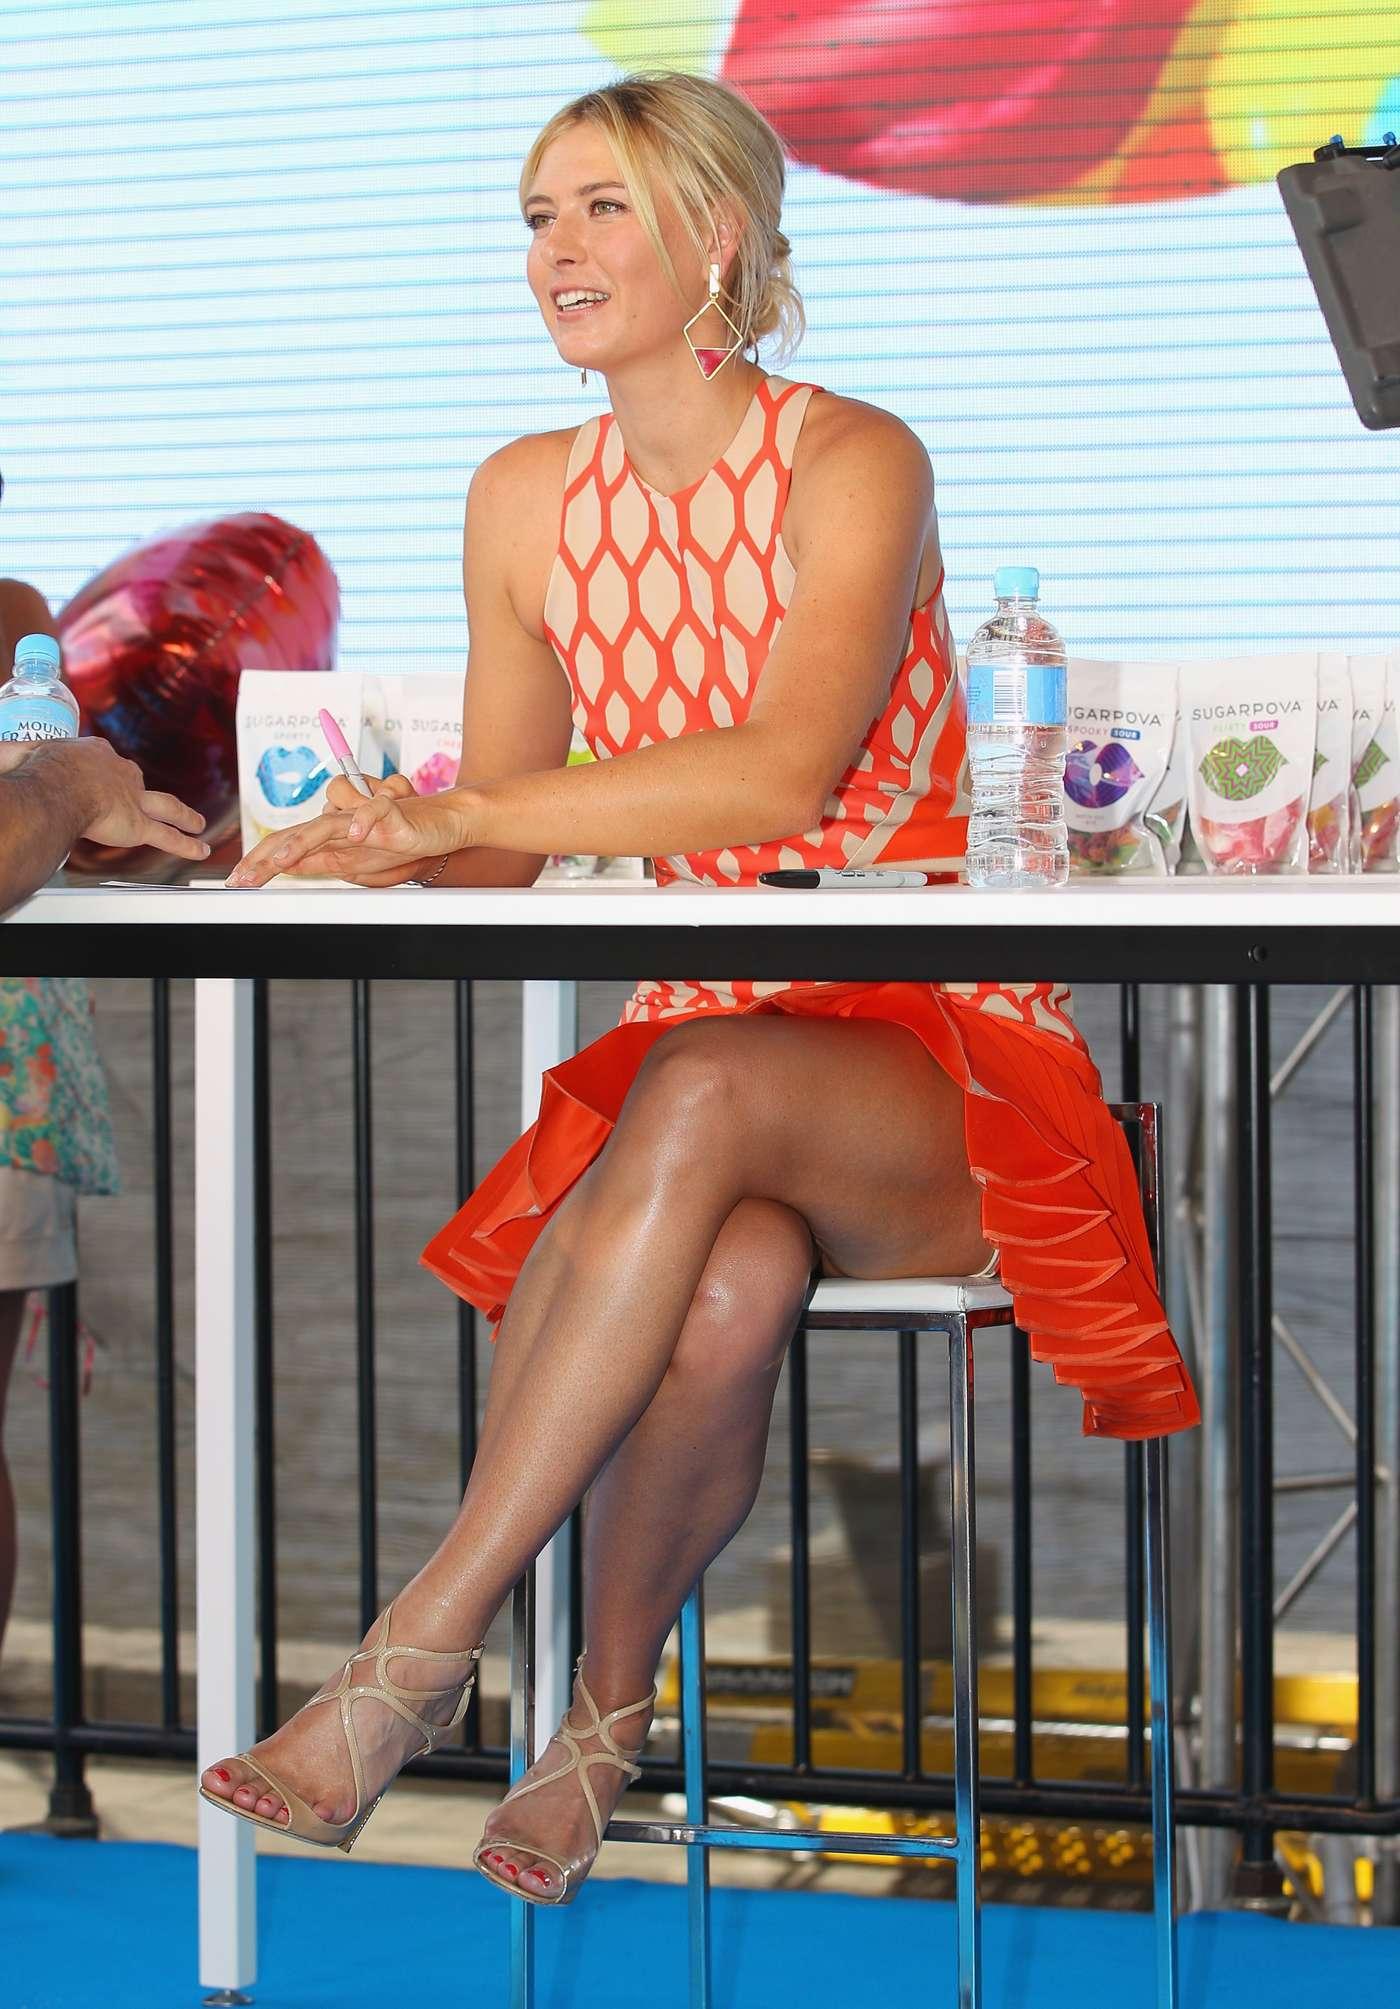 Maria Sharapova at Sugarpova launch -01 | GotCeleb